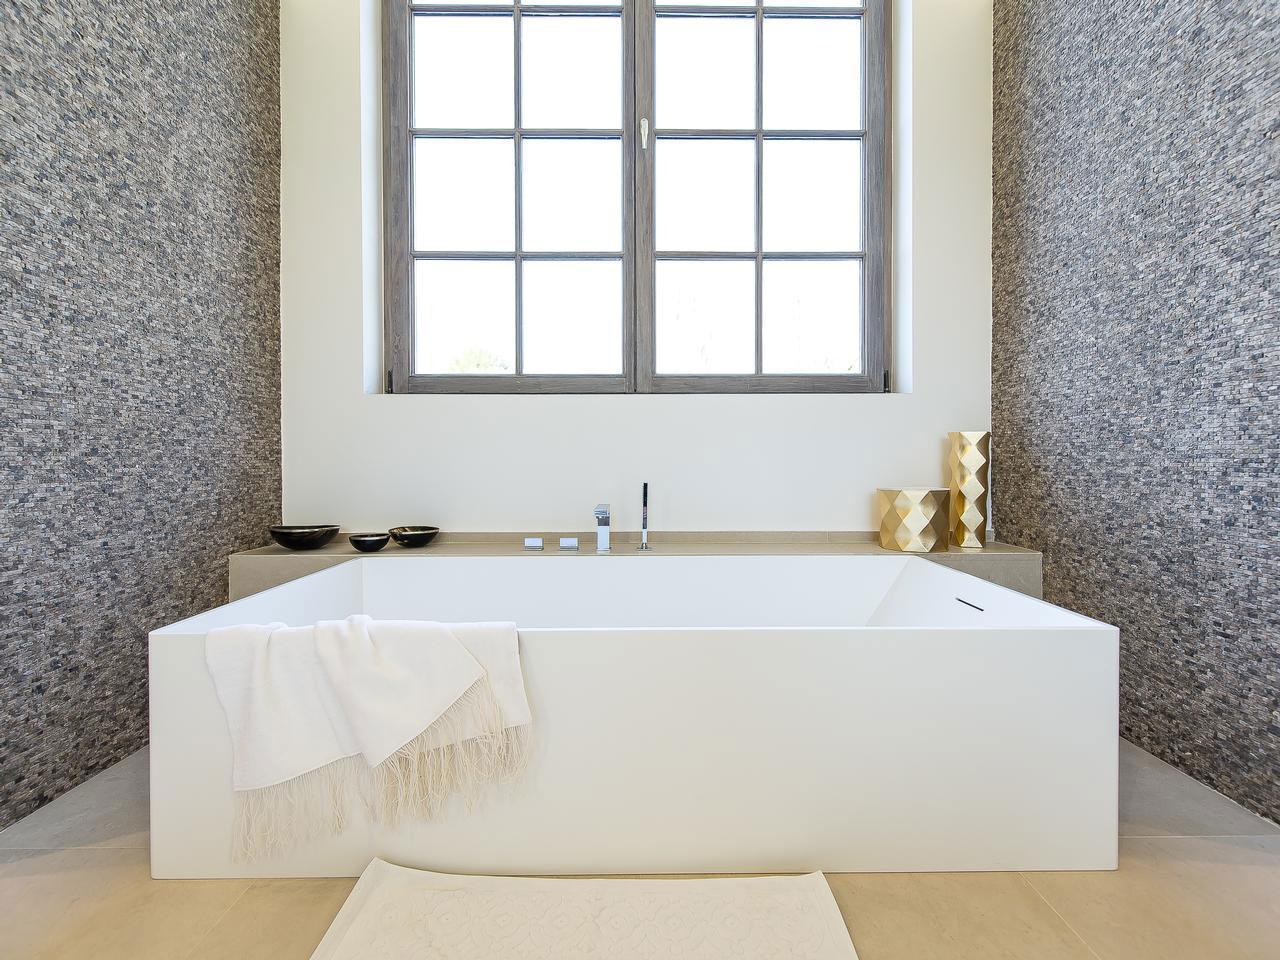 Bath, Grey Walls, House Renovation in Sint-Genesius-Rode, Belgium